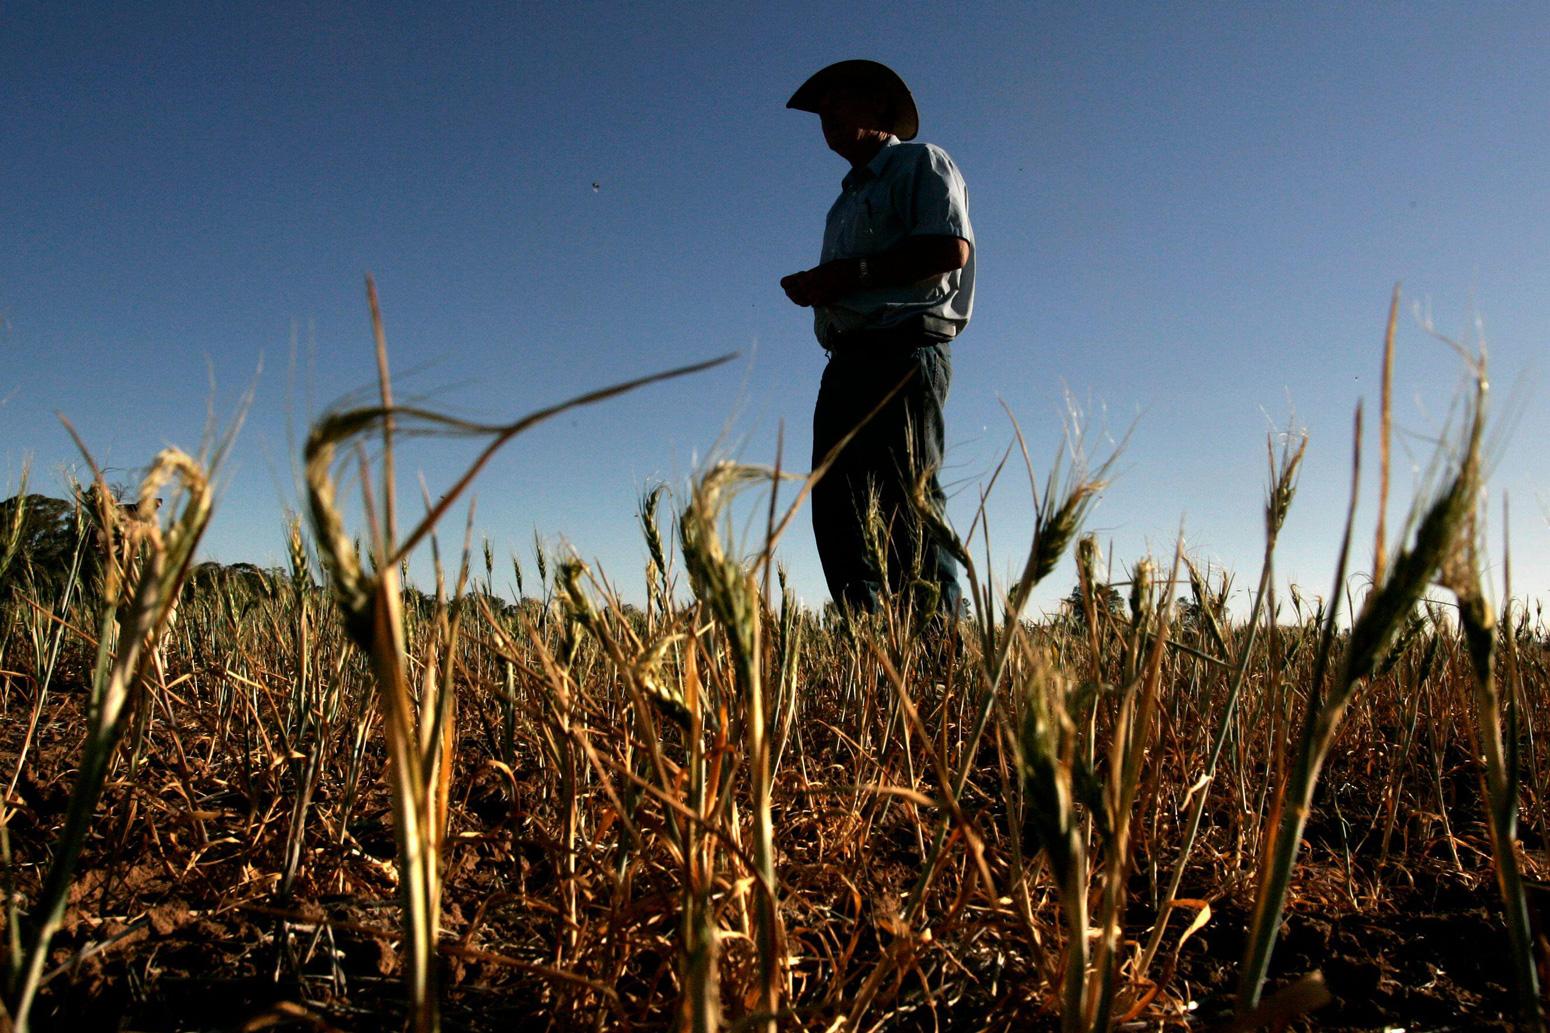 Farmer-stands-over-his-failed-wheat-crop-on-his-farm-near-the-town-of-West-Wyalong-Australia